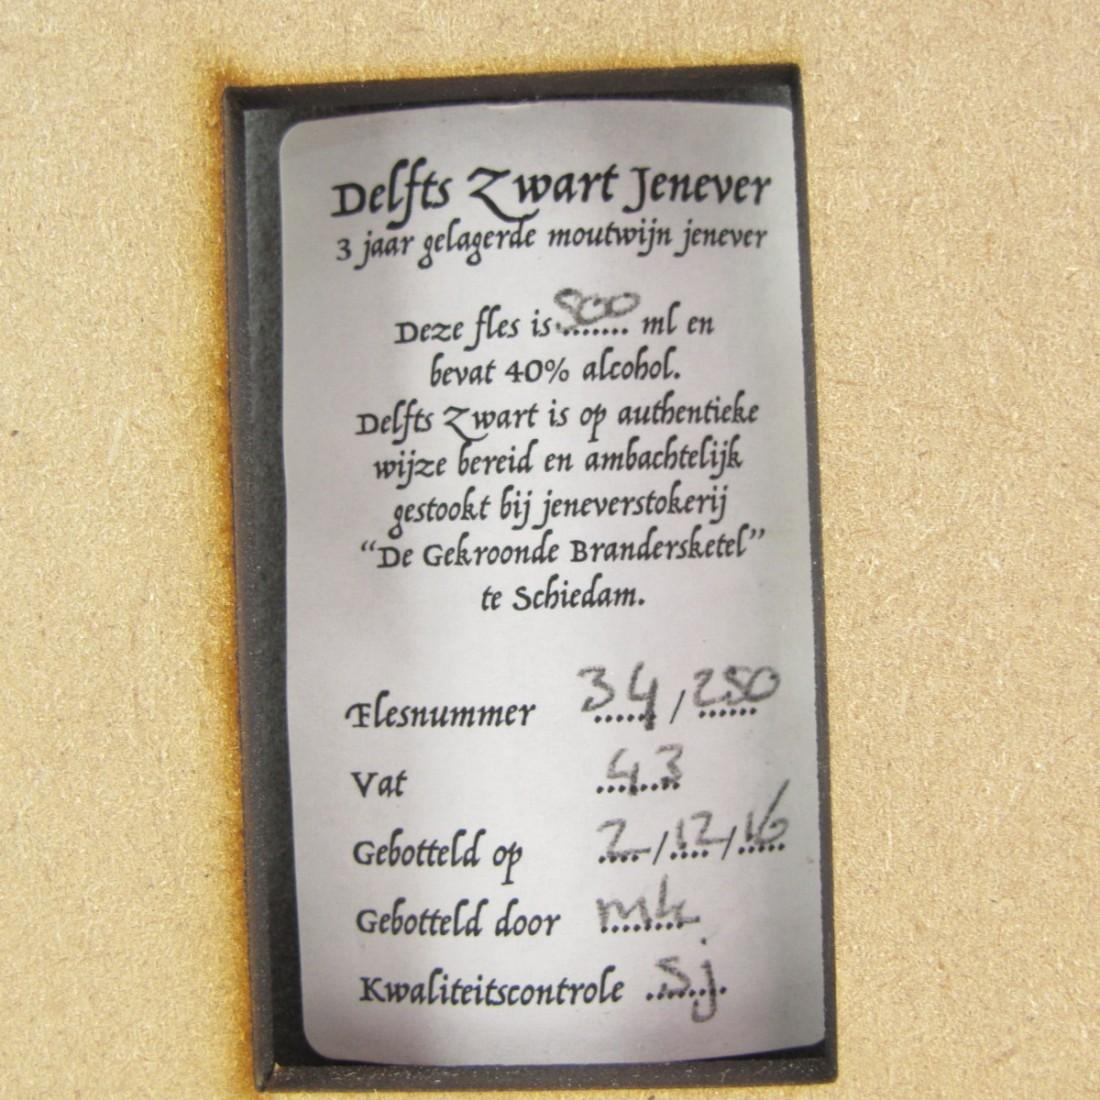 Delfts Zwart Jenever